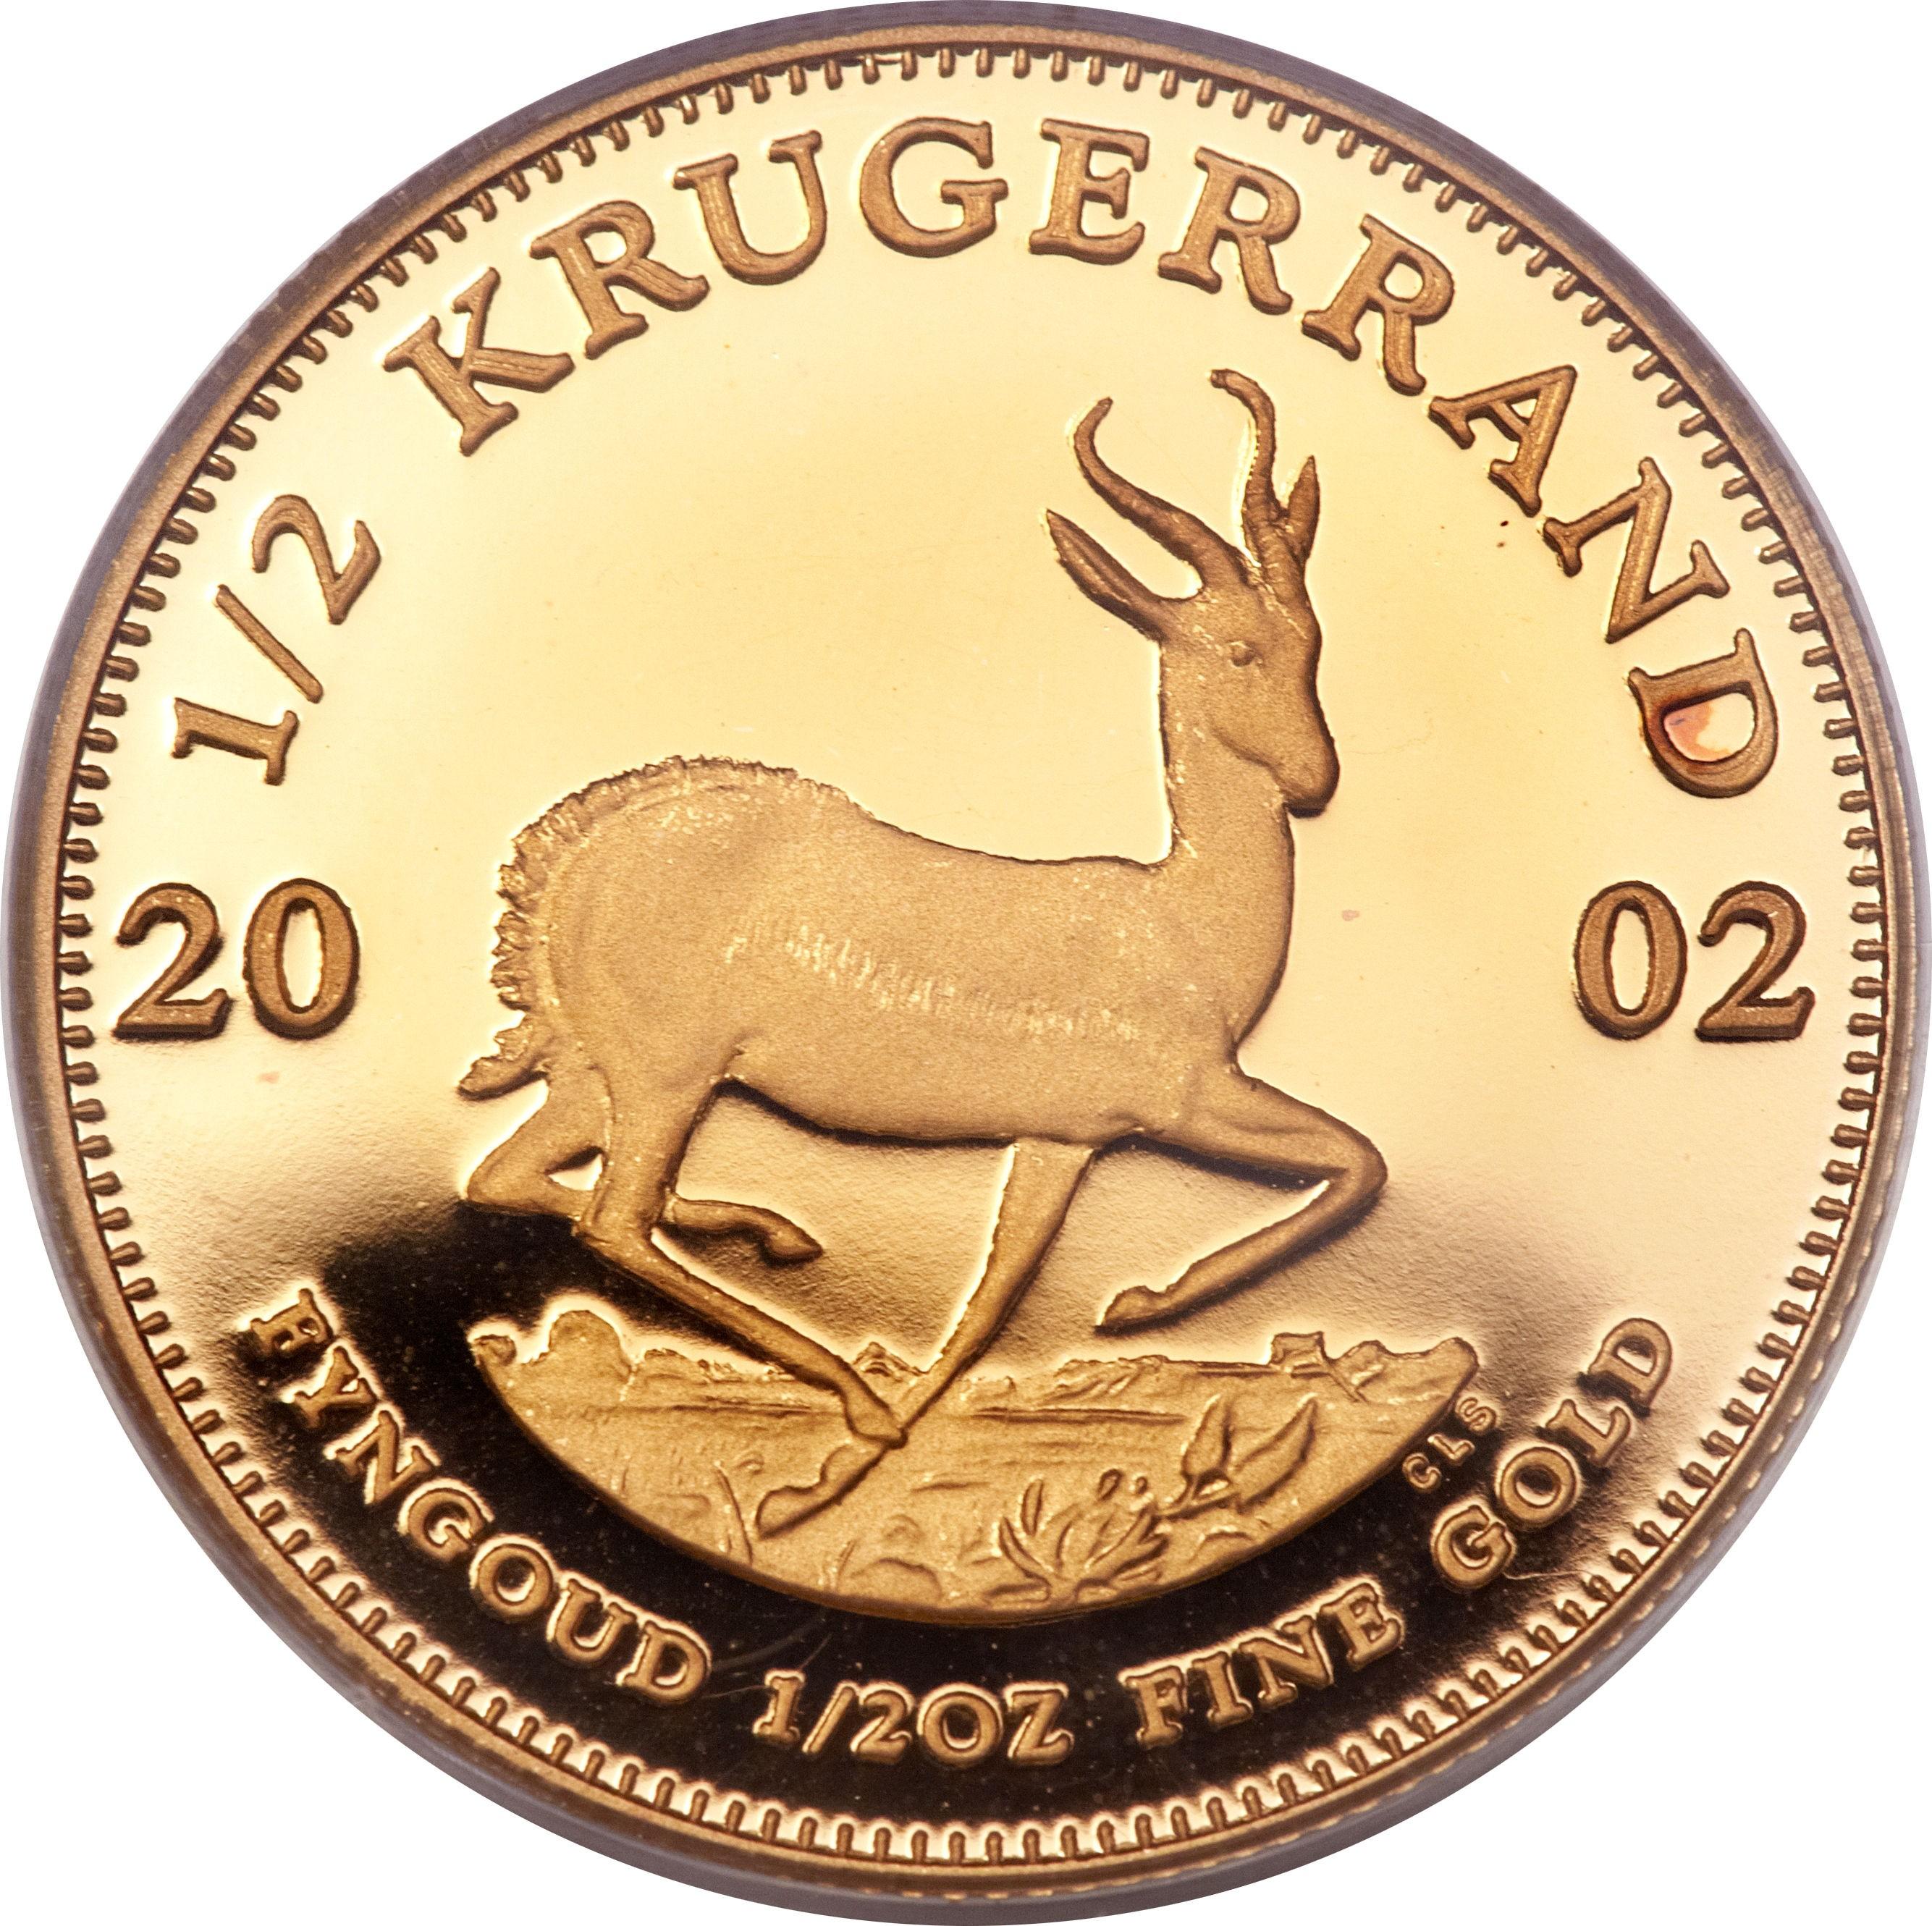 South Africa ½ Ounce Krugerrand (1980-2016)